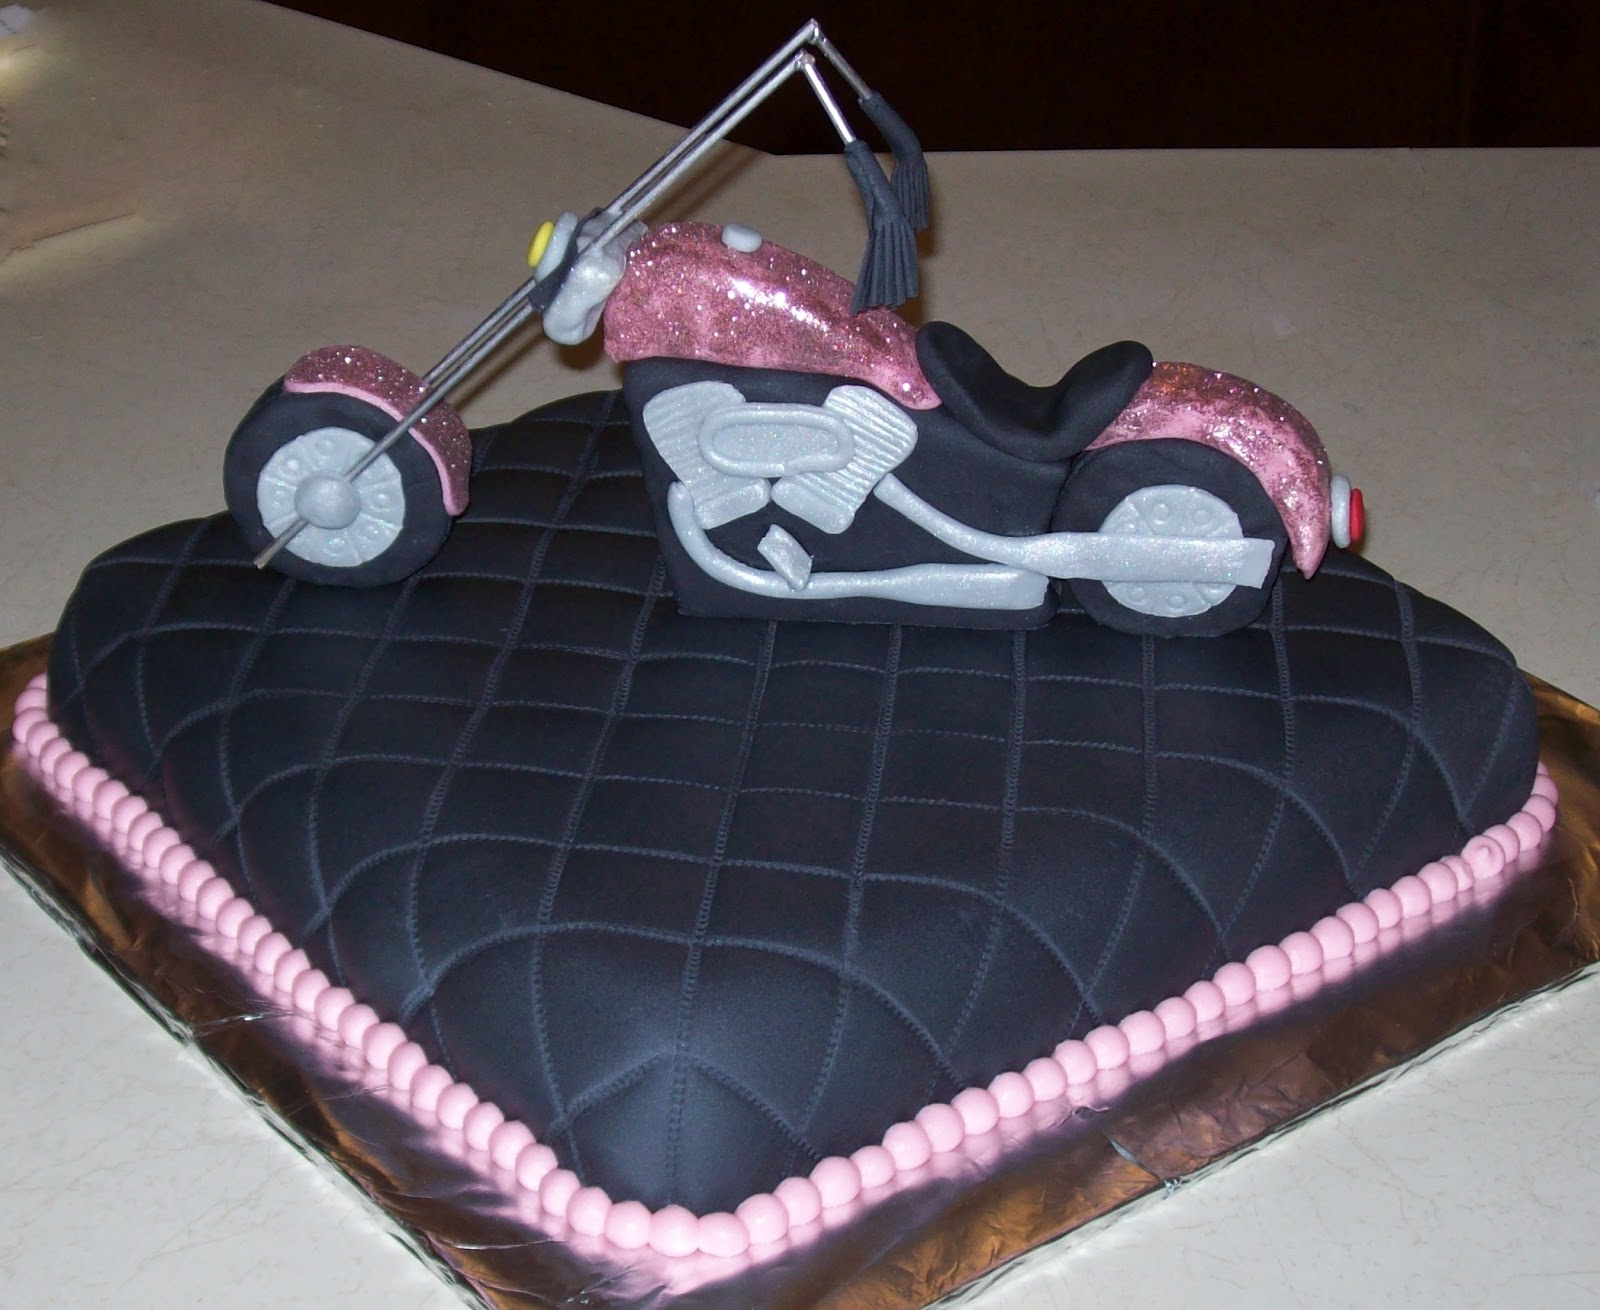 Top Tastes Like Cake: Motorcycle birthday GJ63